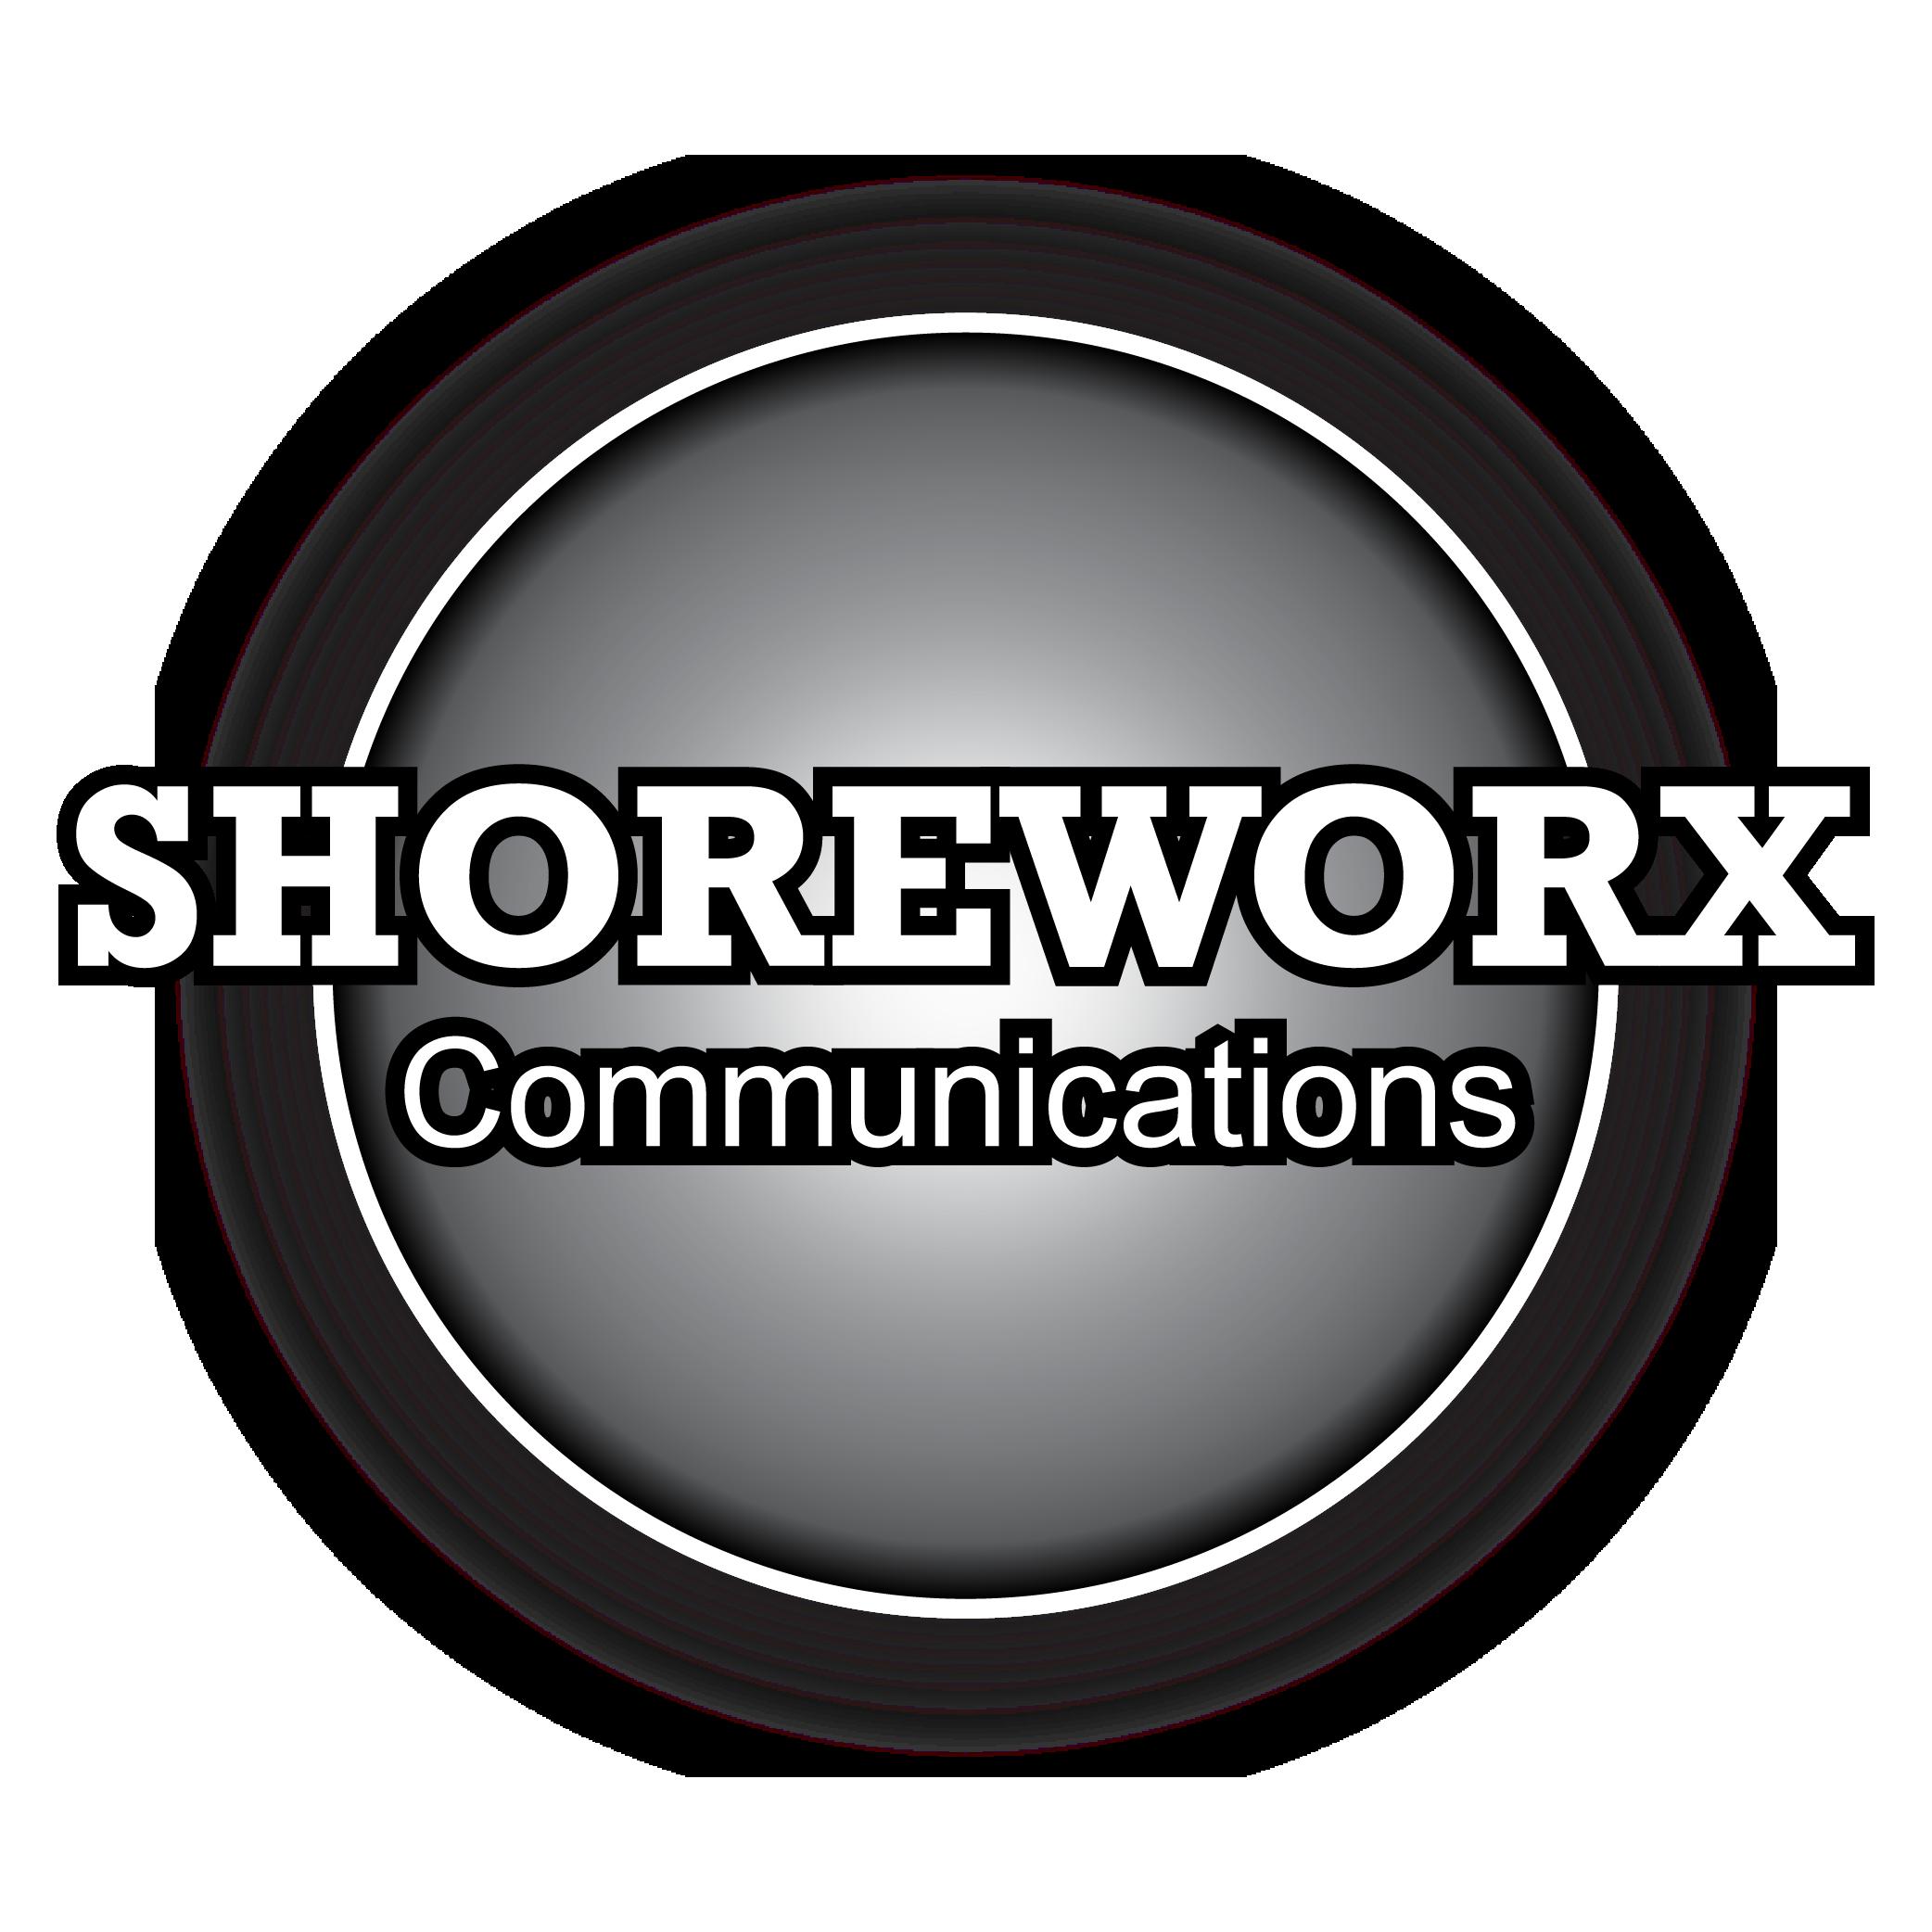 Shoreworx Communications